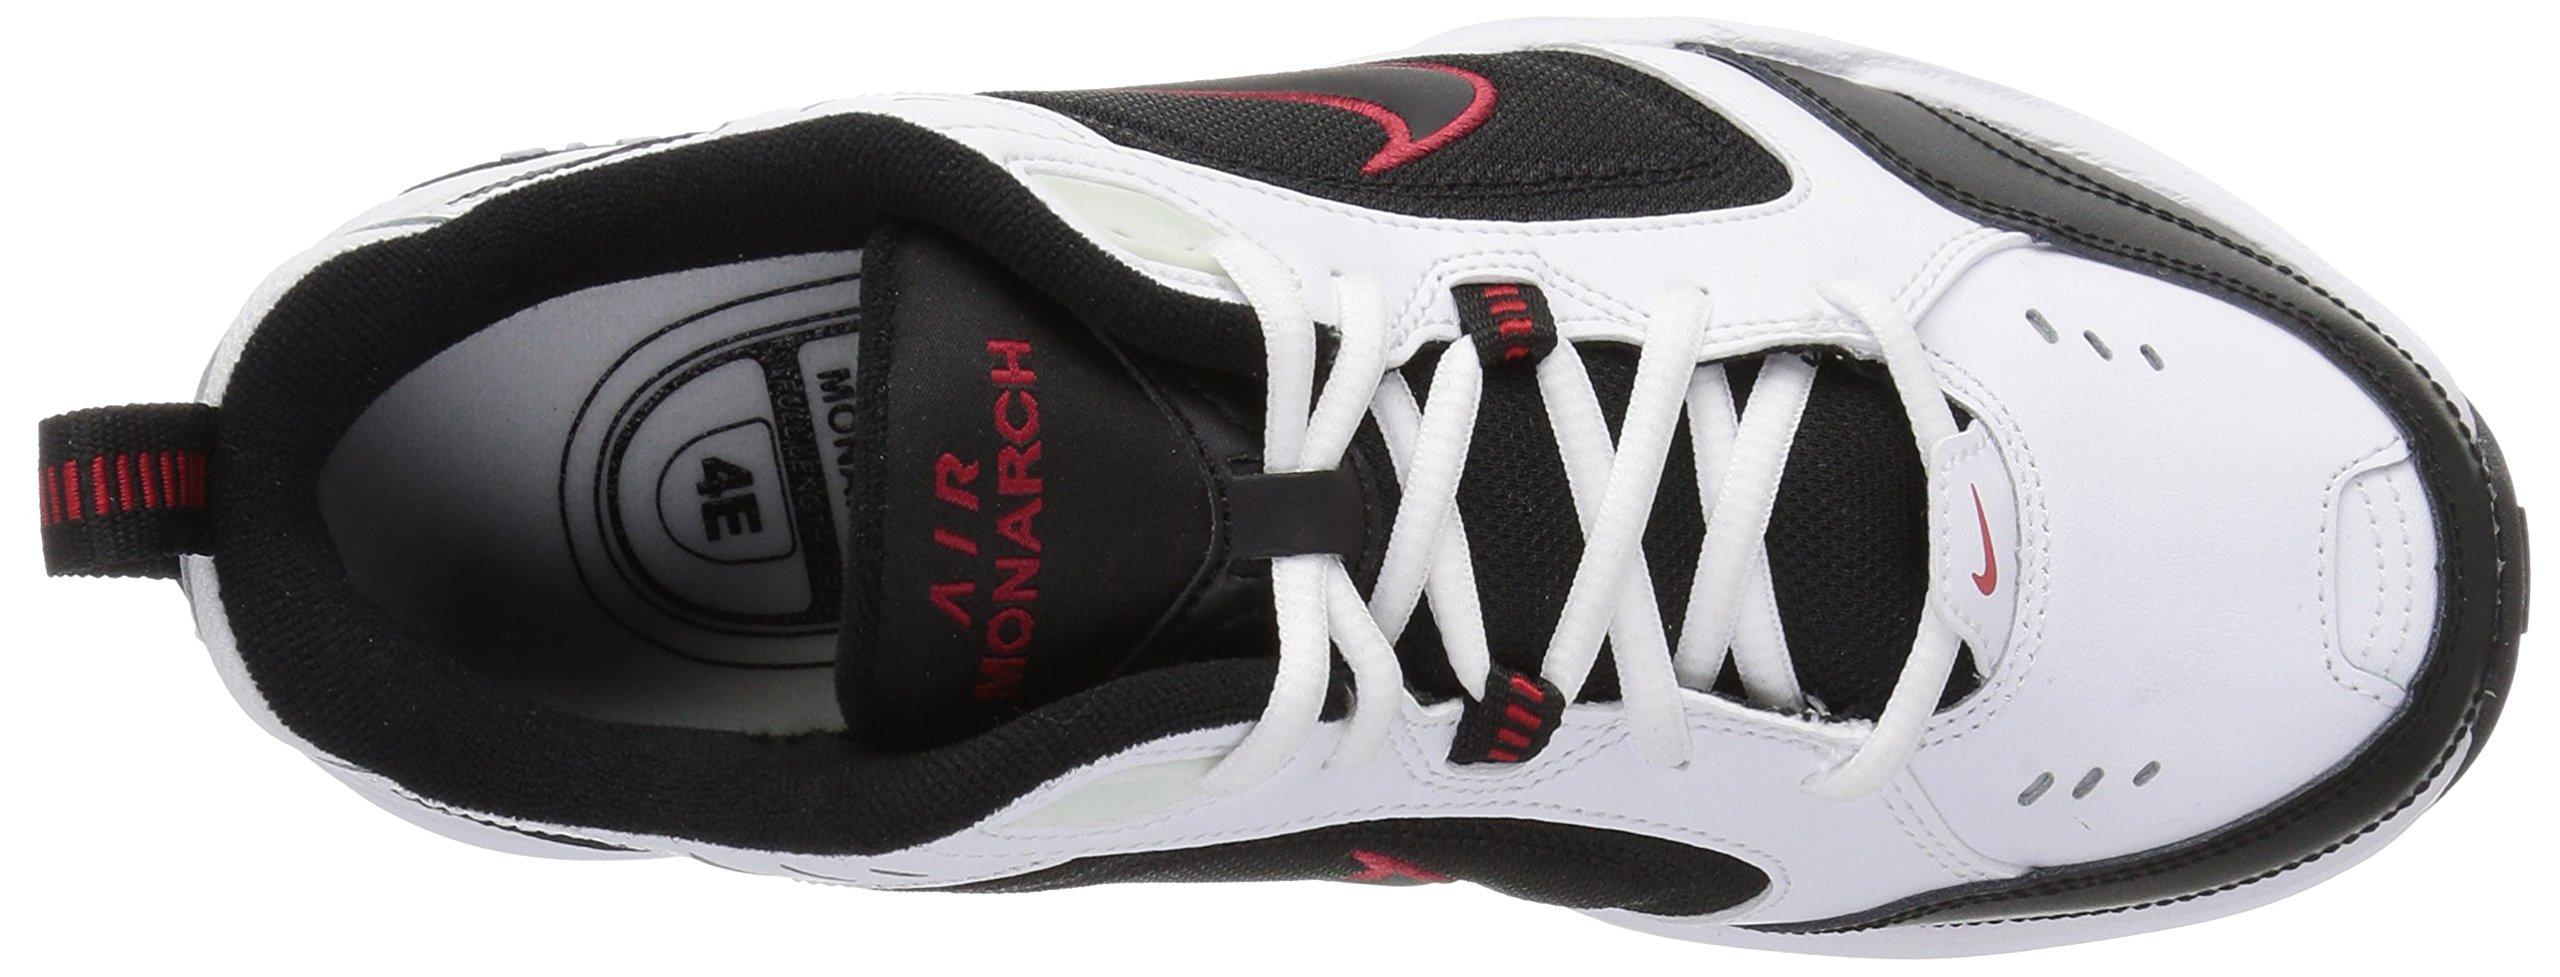 Nike Men's Air Monarch IV Cross Trainer, White/Black, 7.0 Regular US by Nike (Image #14)